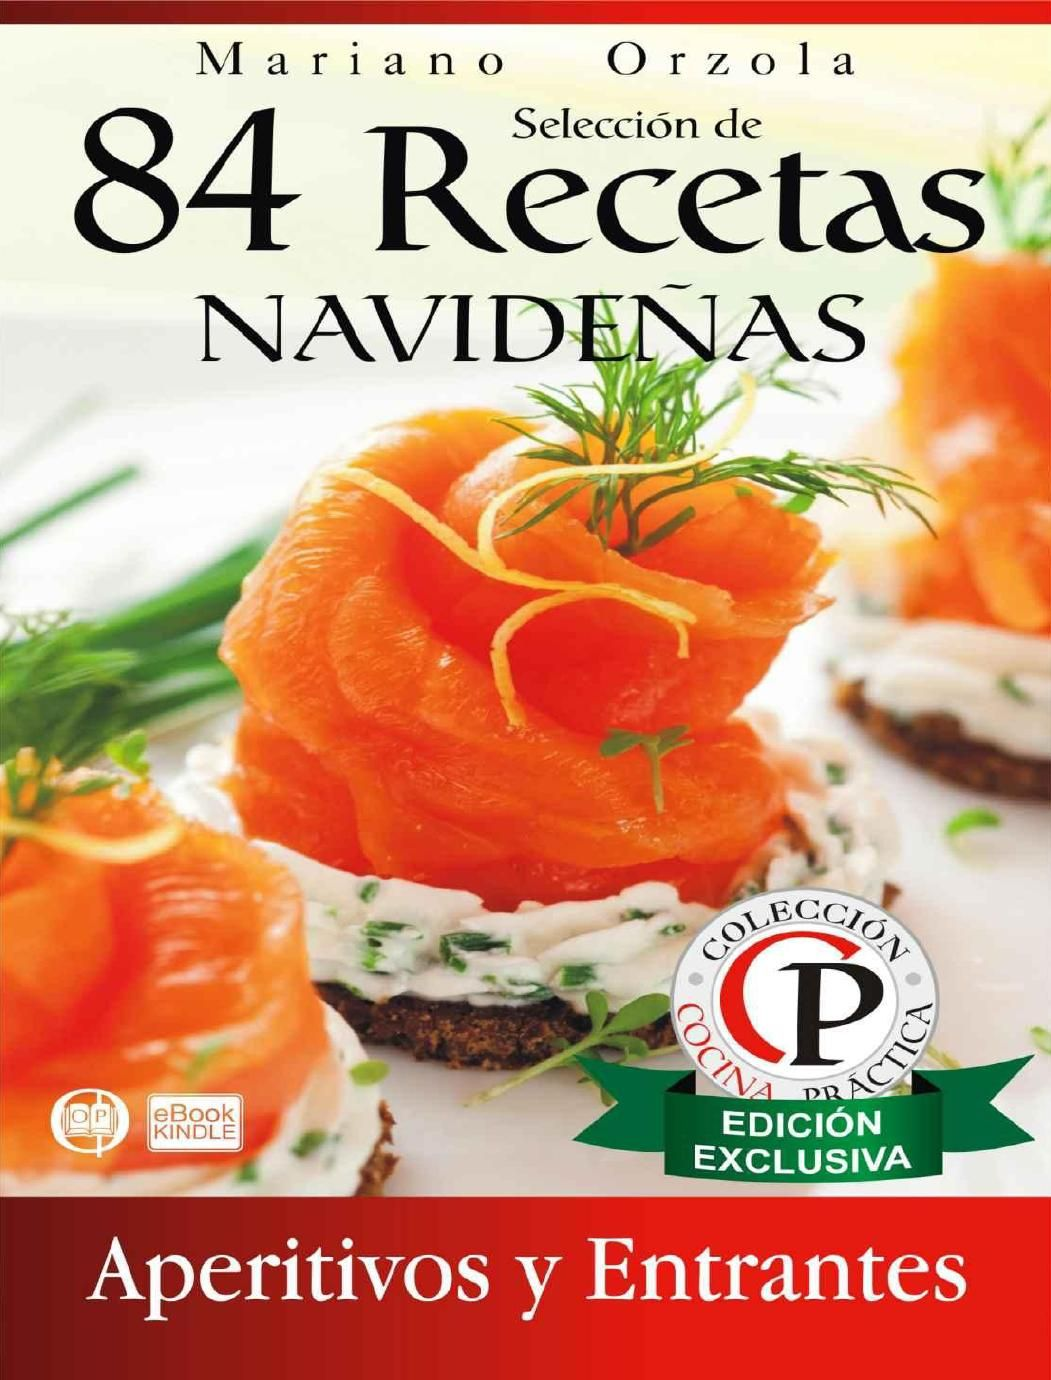 84 recetas navide as aperitivos y entrantes mariano orzola - Cocina navidena espanola ...